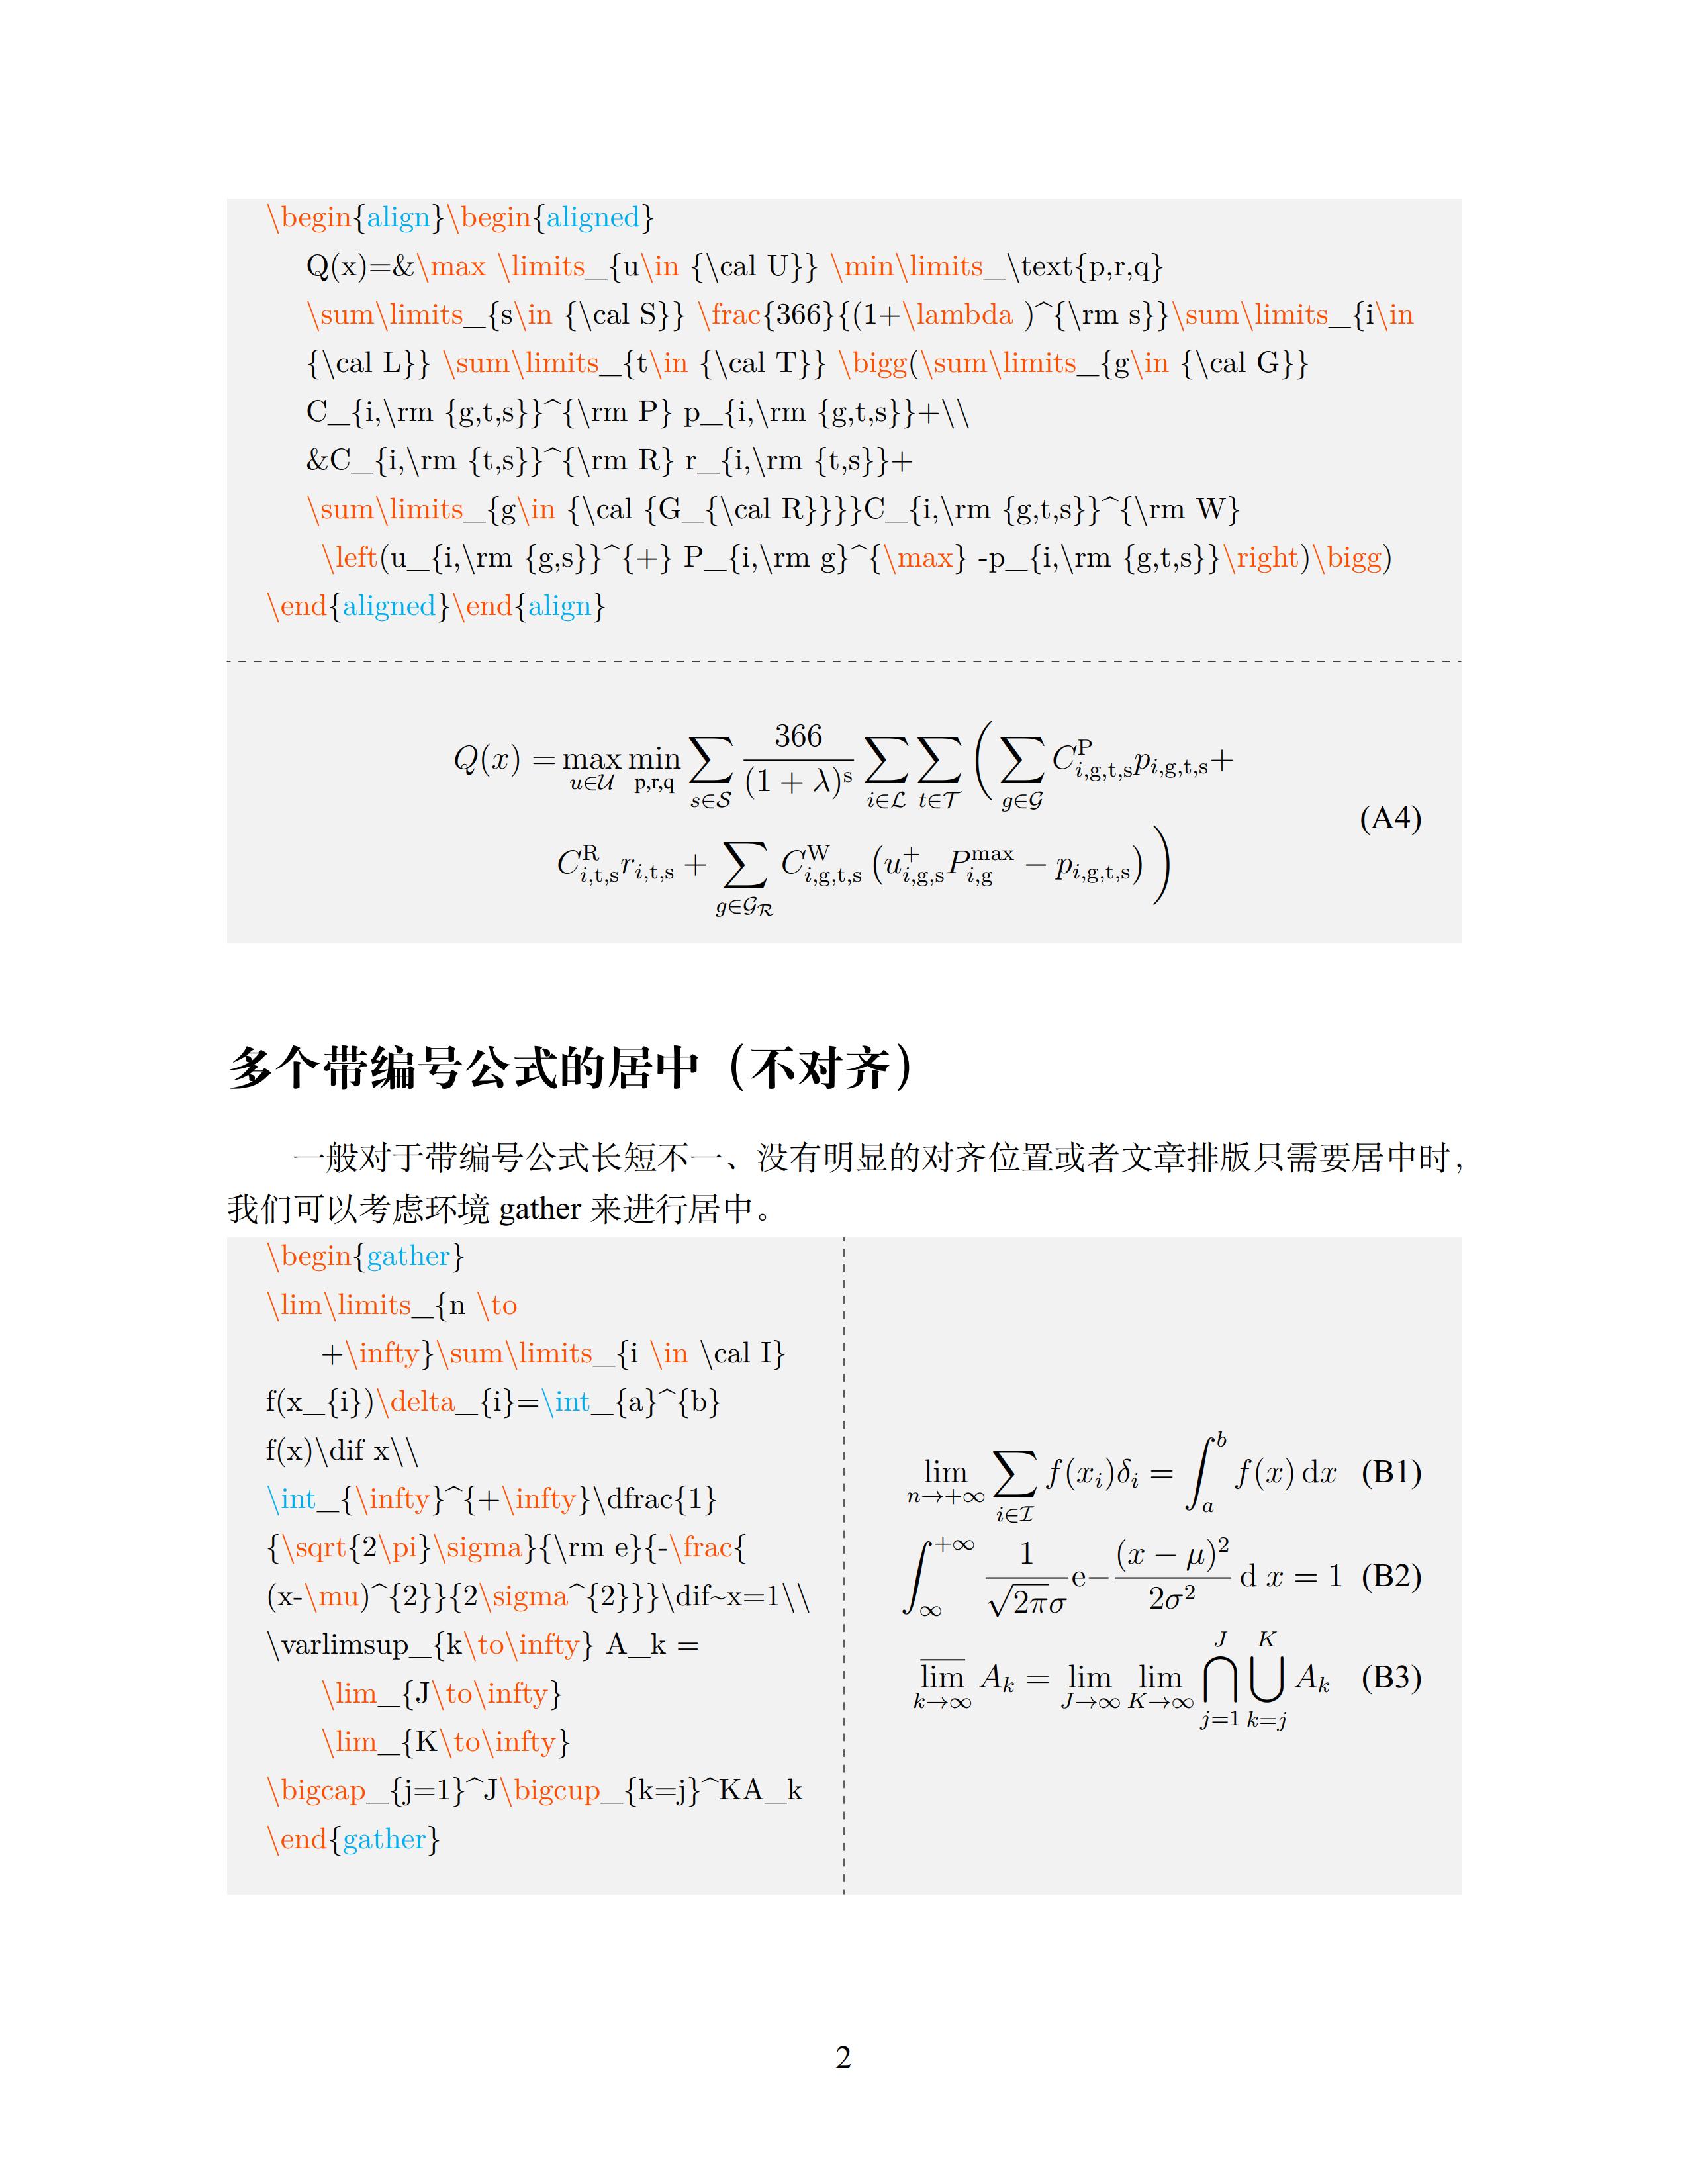 Align, gather 多个数学公式对其居中问题